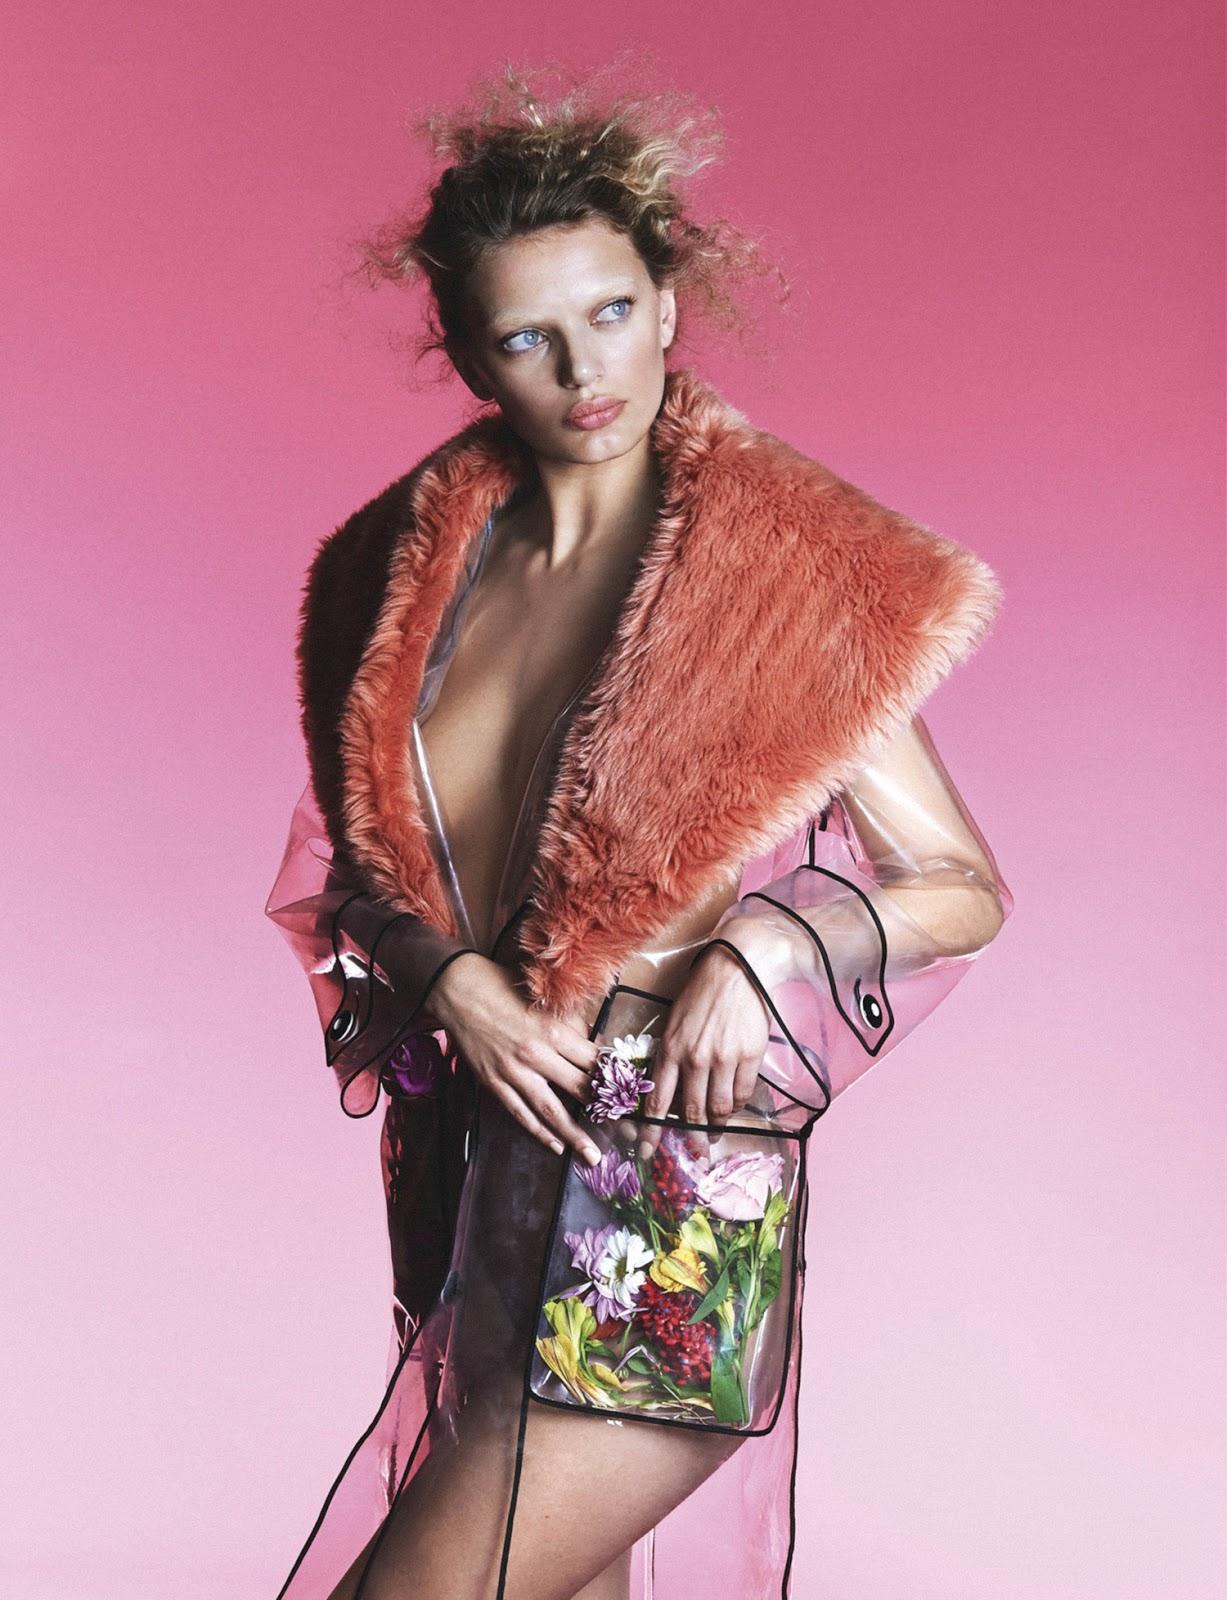 Bregje Heinen - Narcisse Magazine Photo Shoot by Rowan Papier